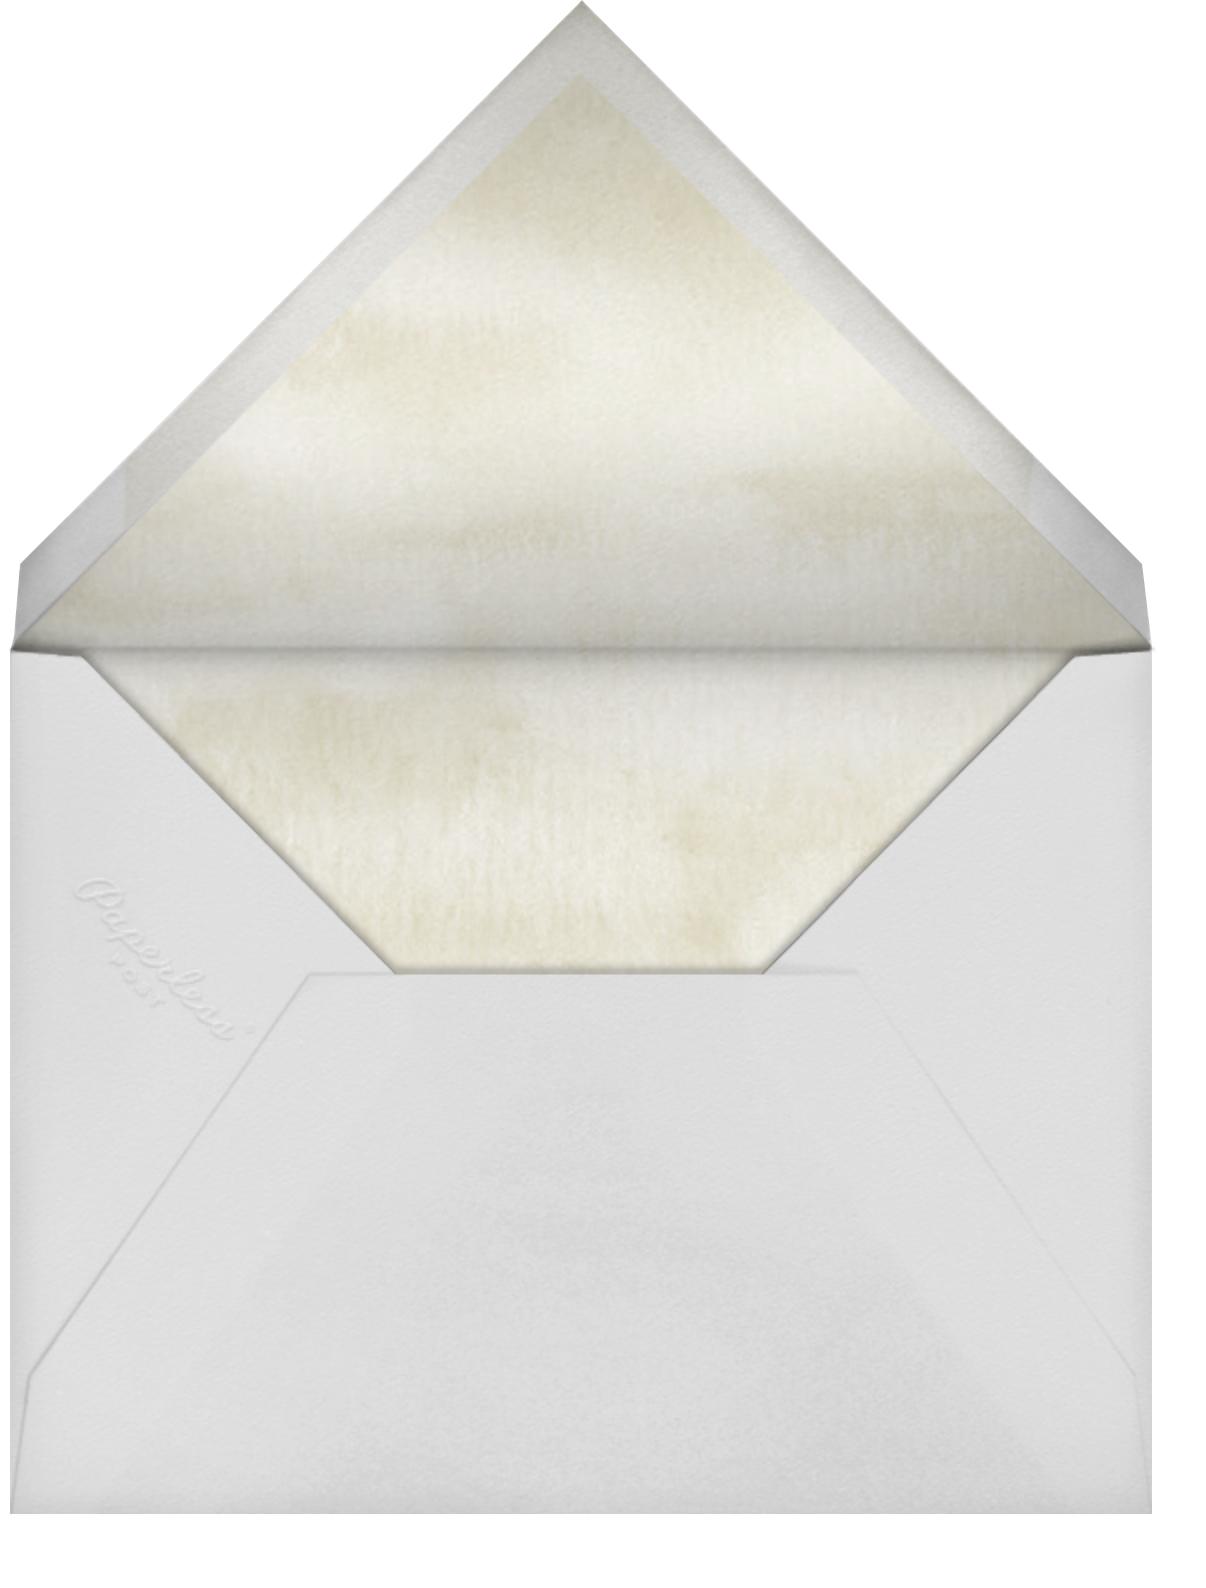 Naiad Photo - Felix Doolittle - Adult birthday - envelope back